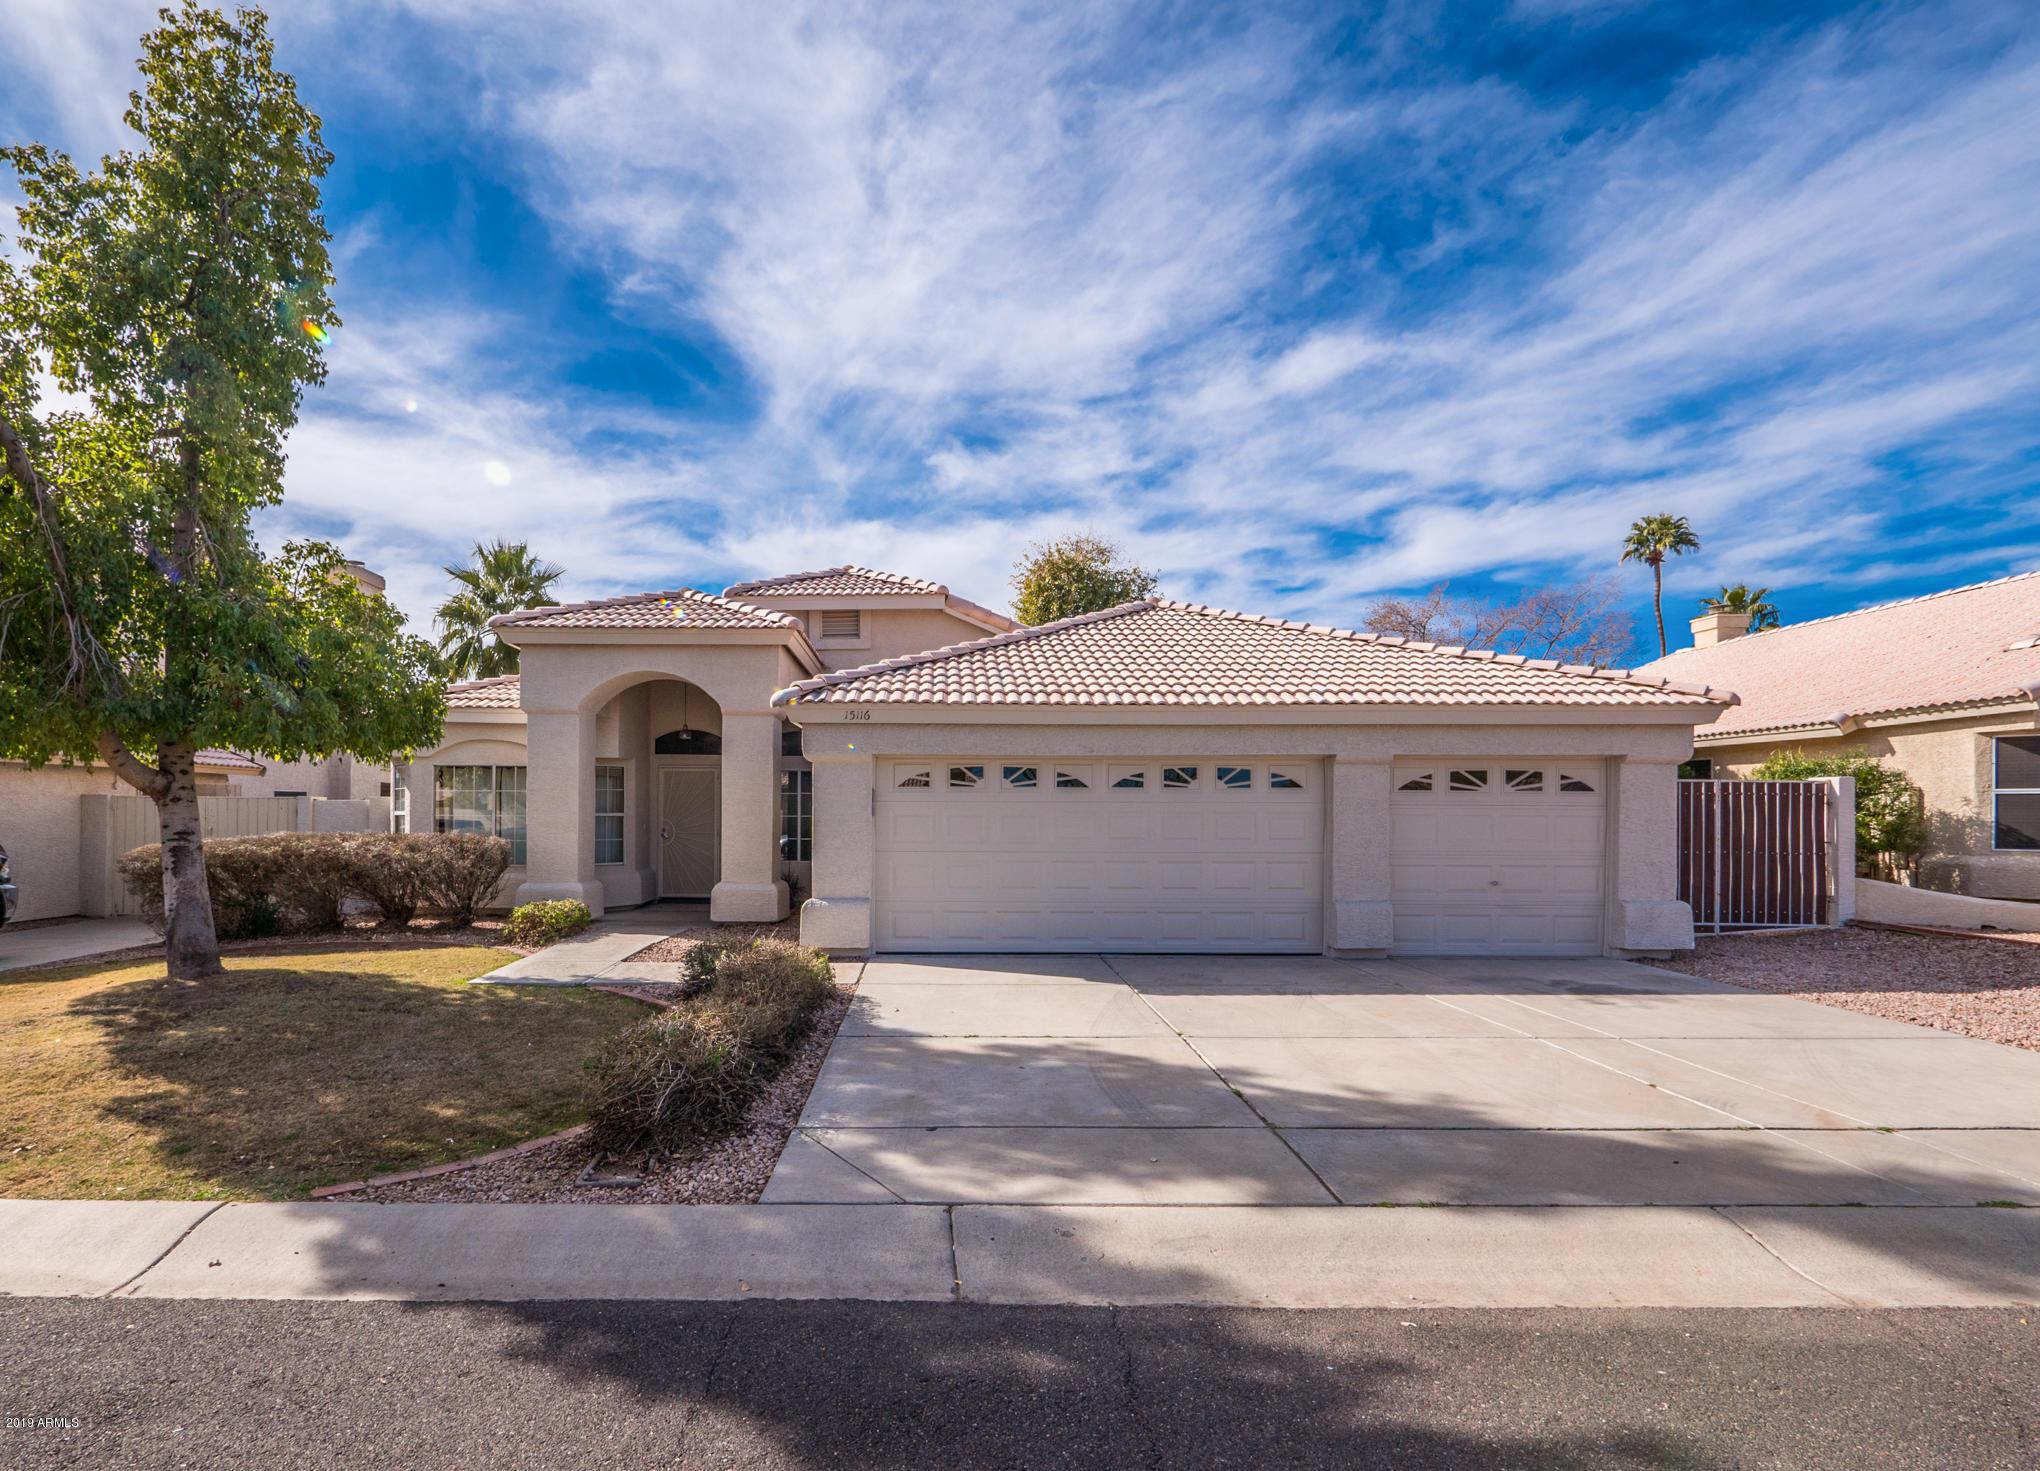 15116 N 90TH Avenue, Peoria, Arizona